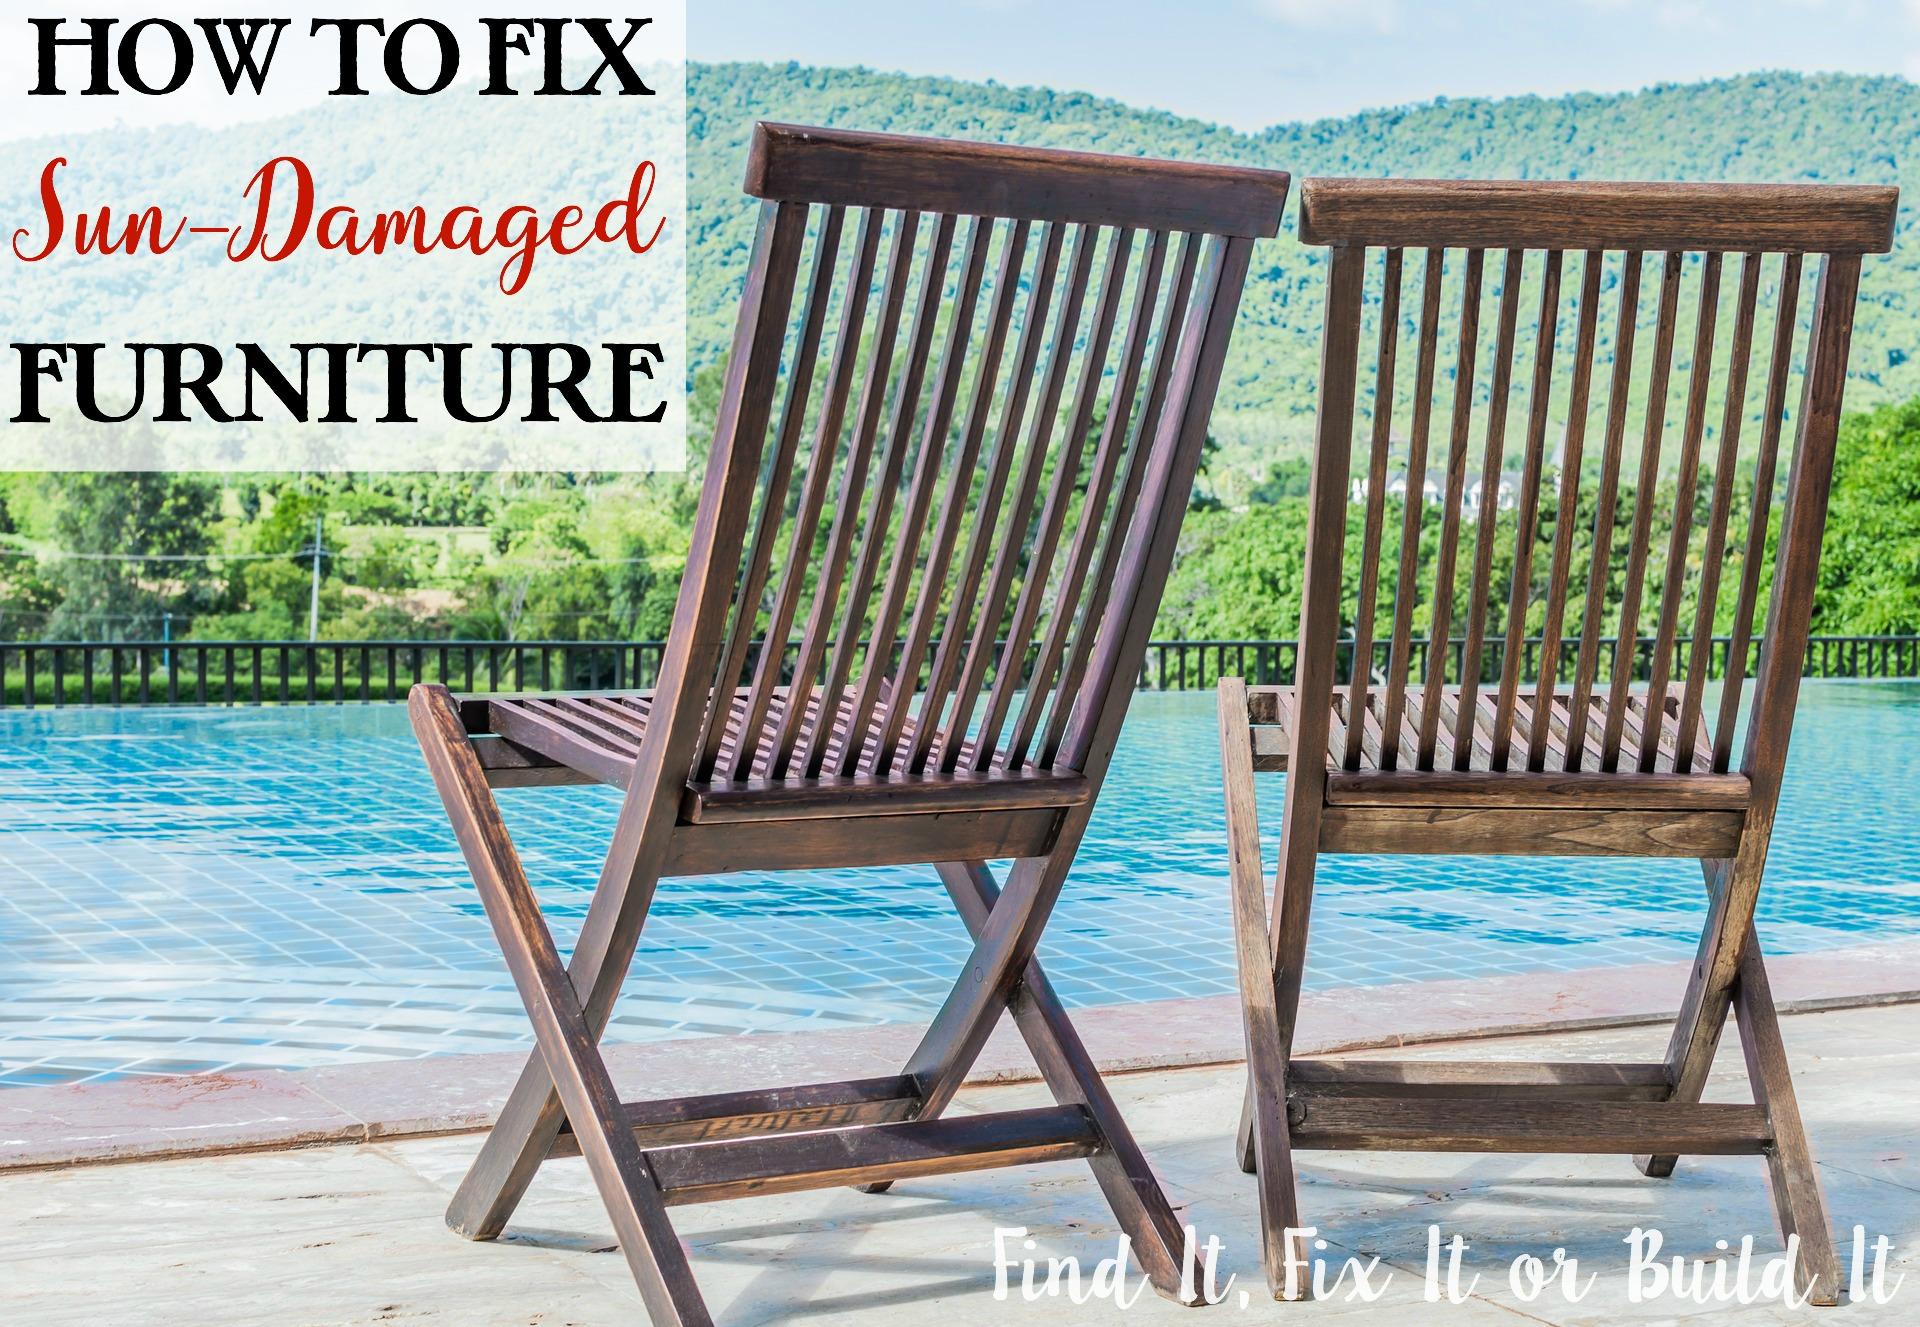 Sun-Damaged-Chair-Cover